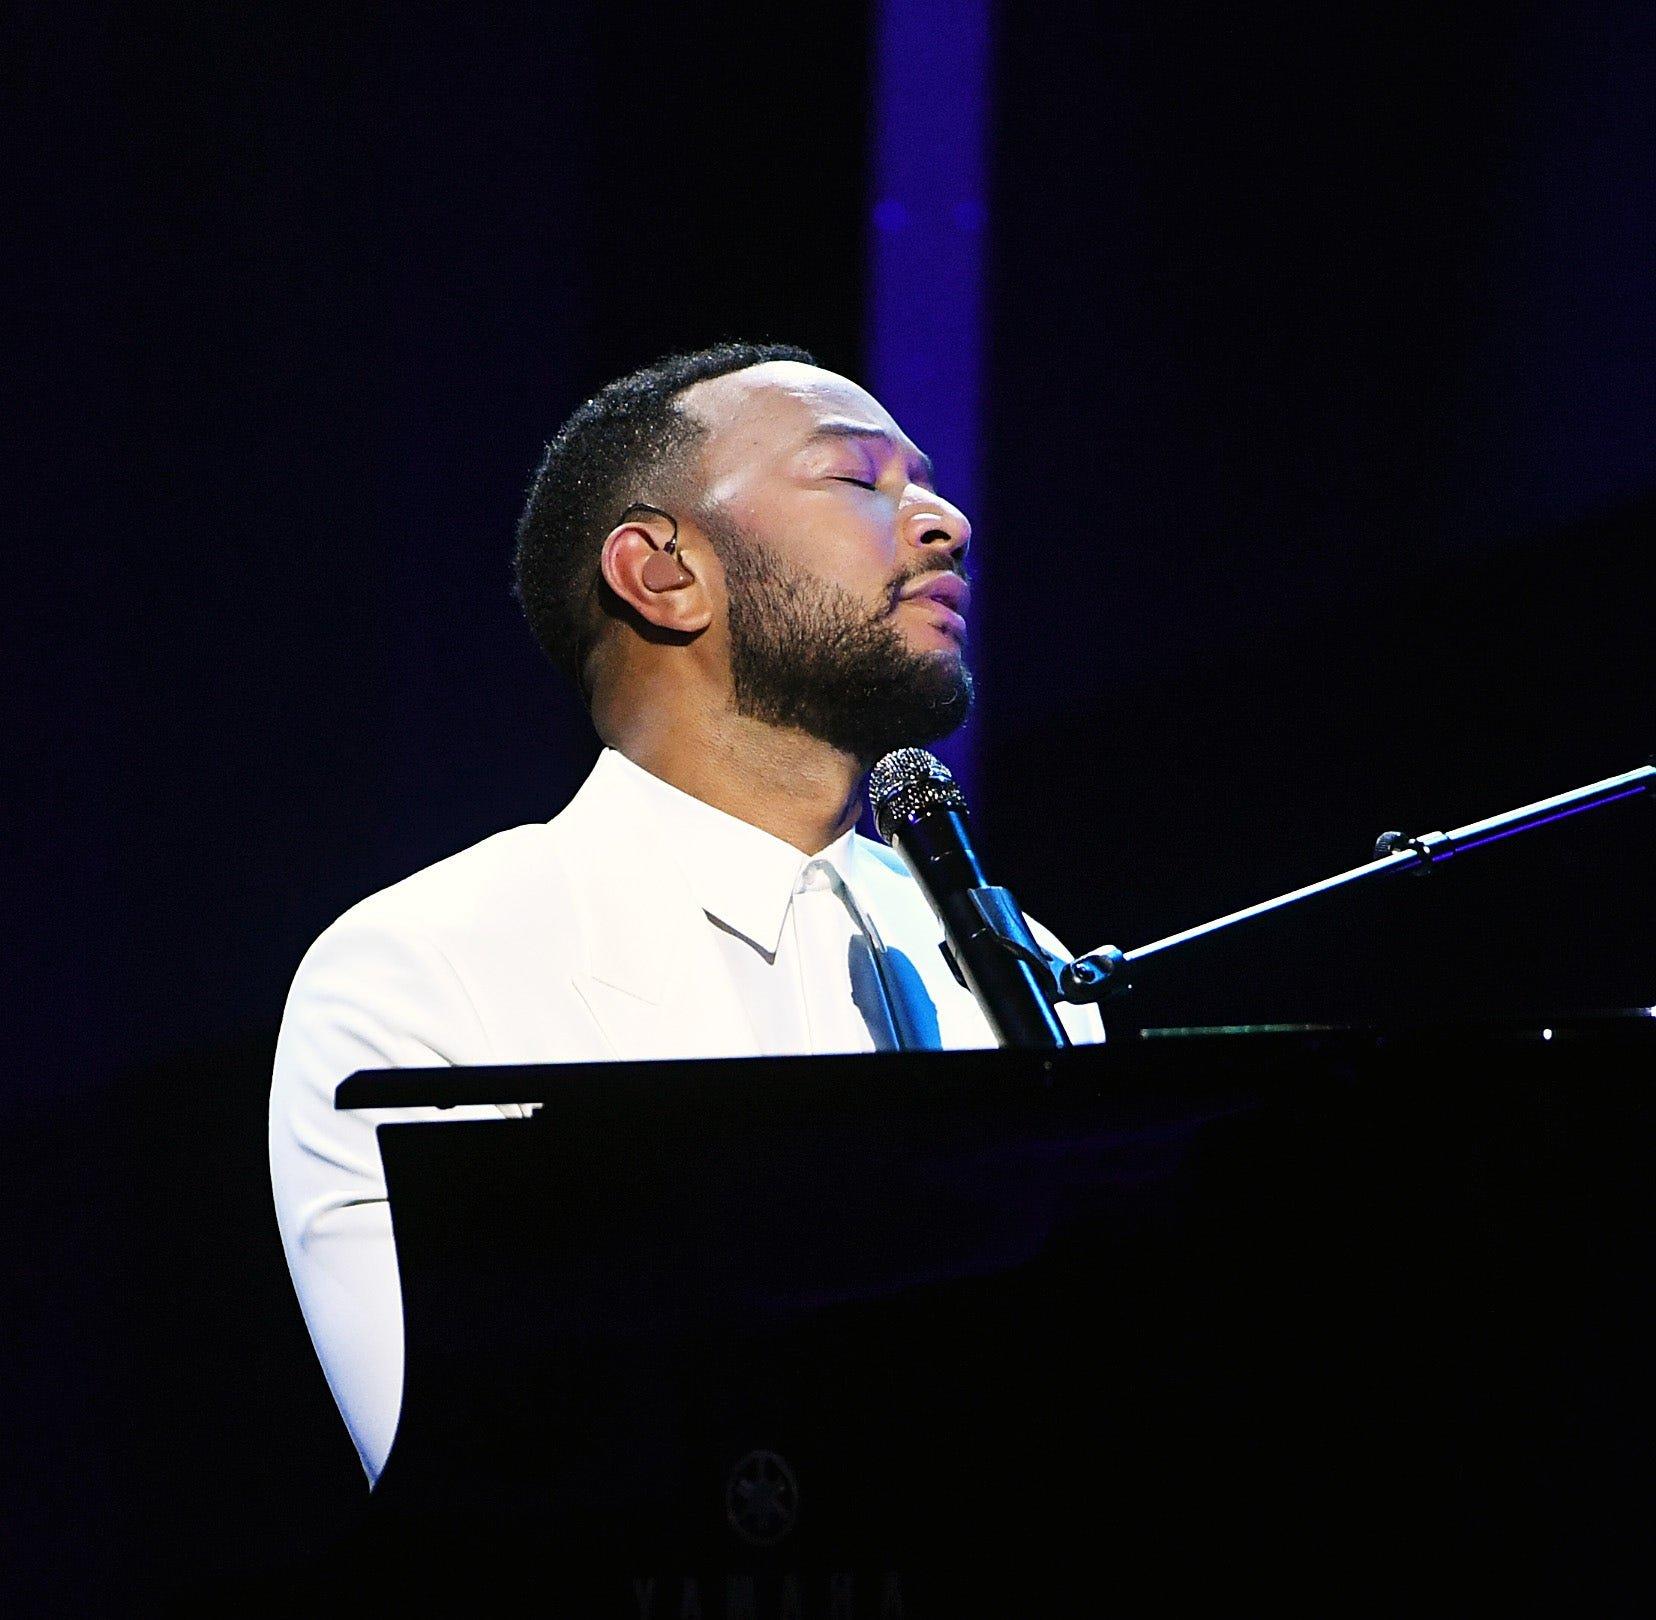 John Legend dedicates Billboard performance to wife after pregnancy loss